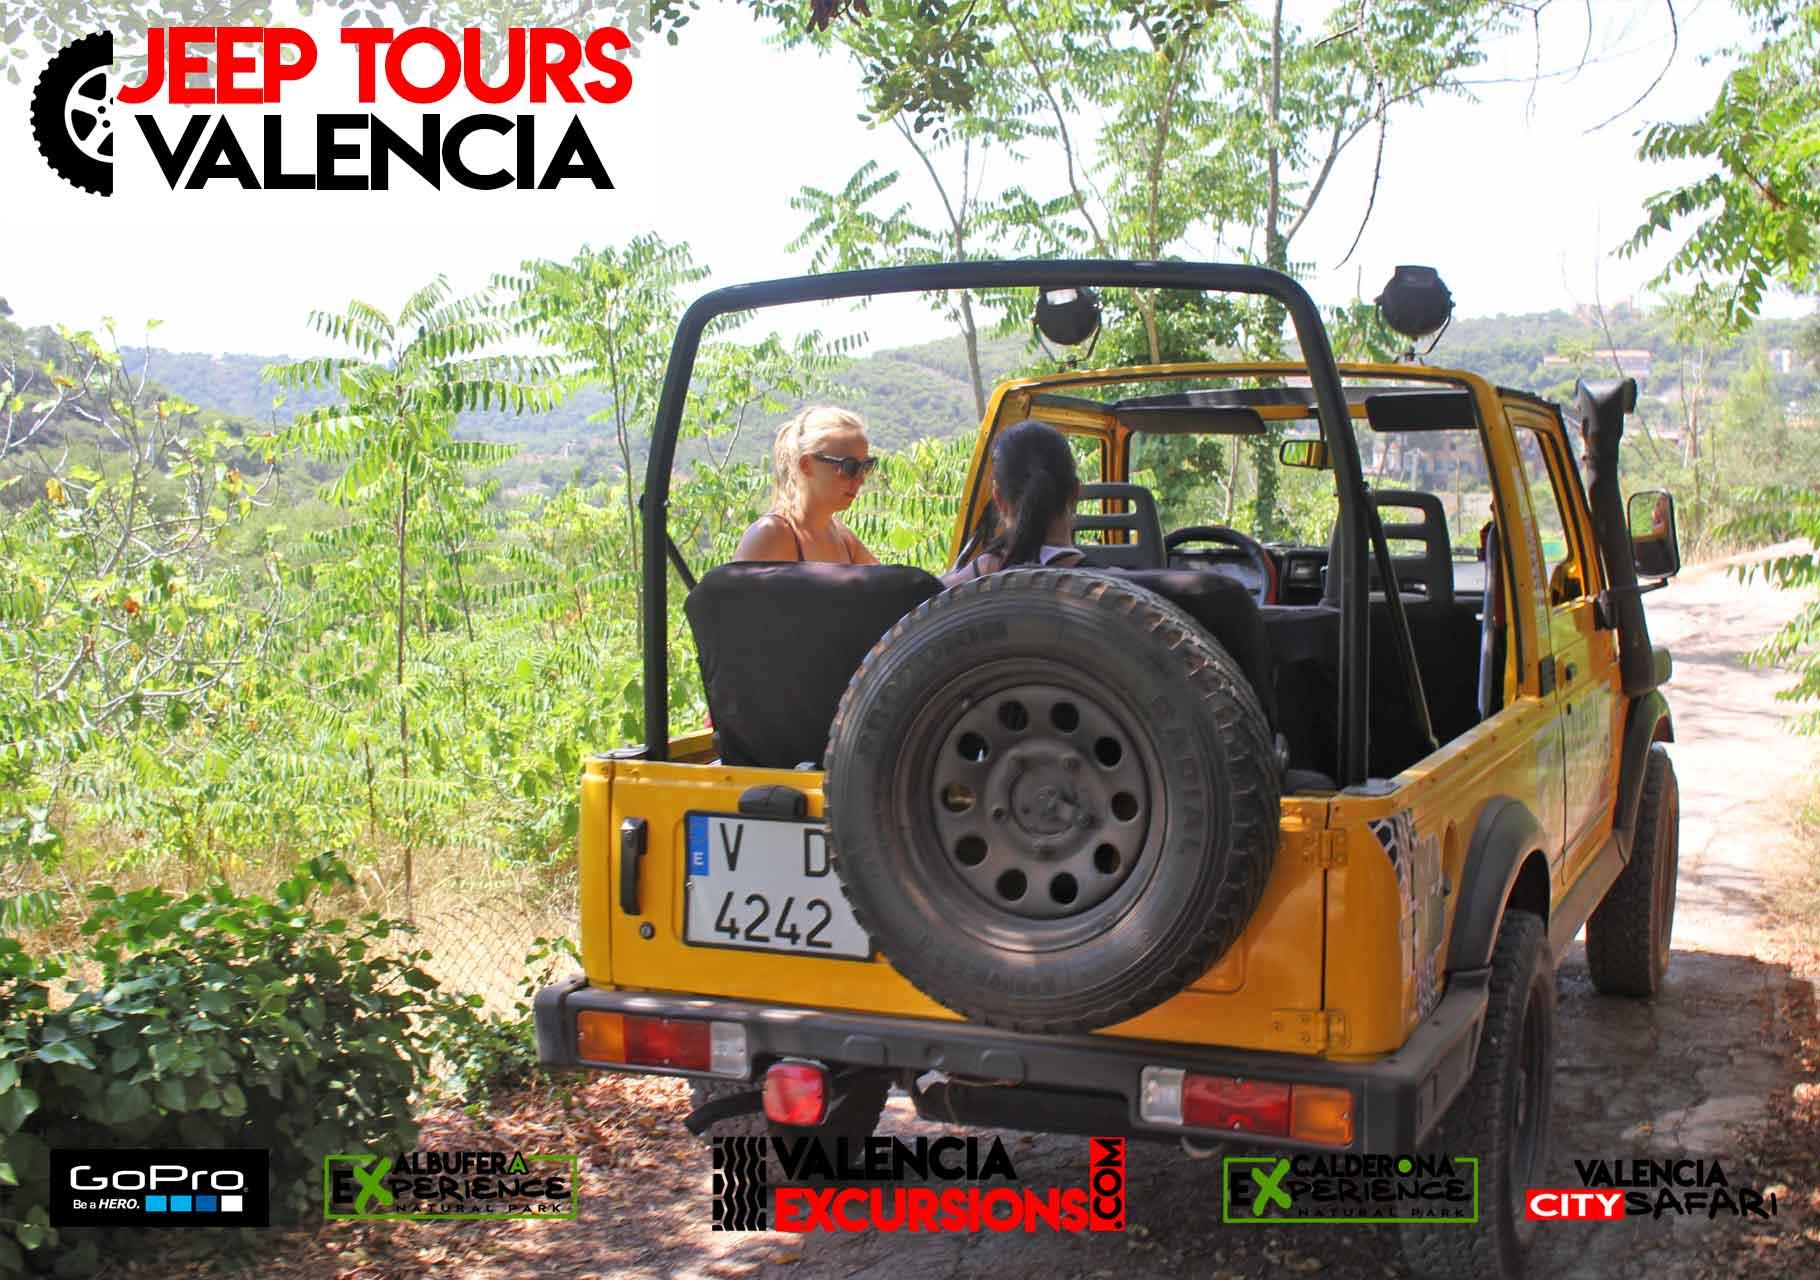 Valencia Excursions jeep tours Sehenswürdigkeiten Valencia und  Umgebung.